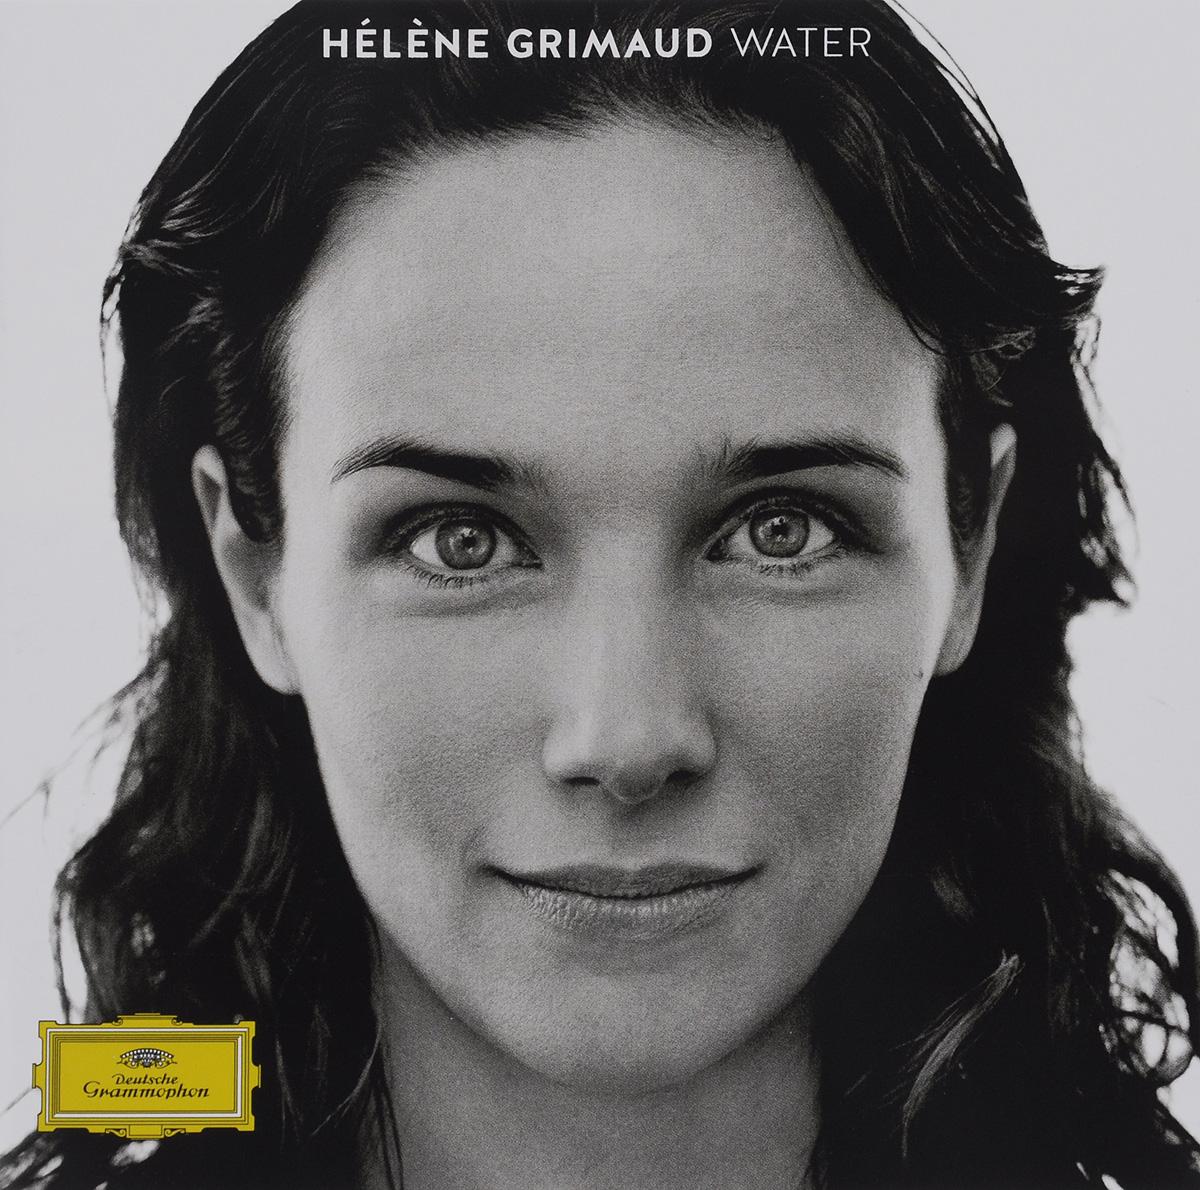 Helene Grimaud. Water